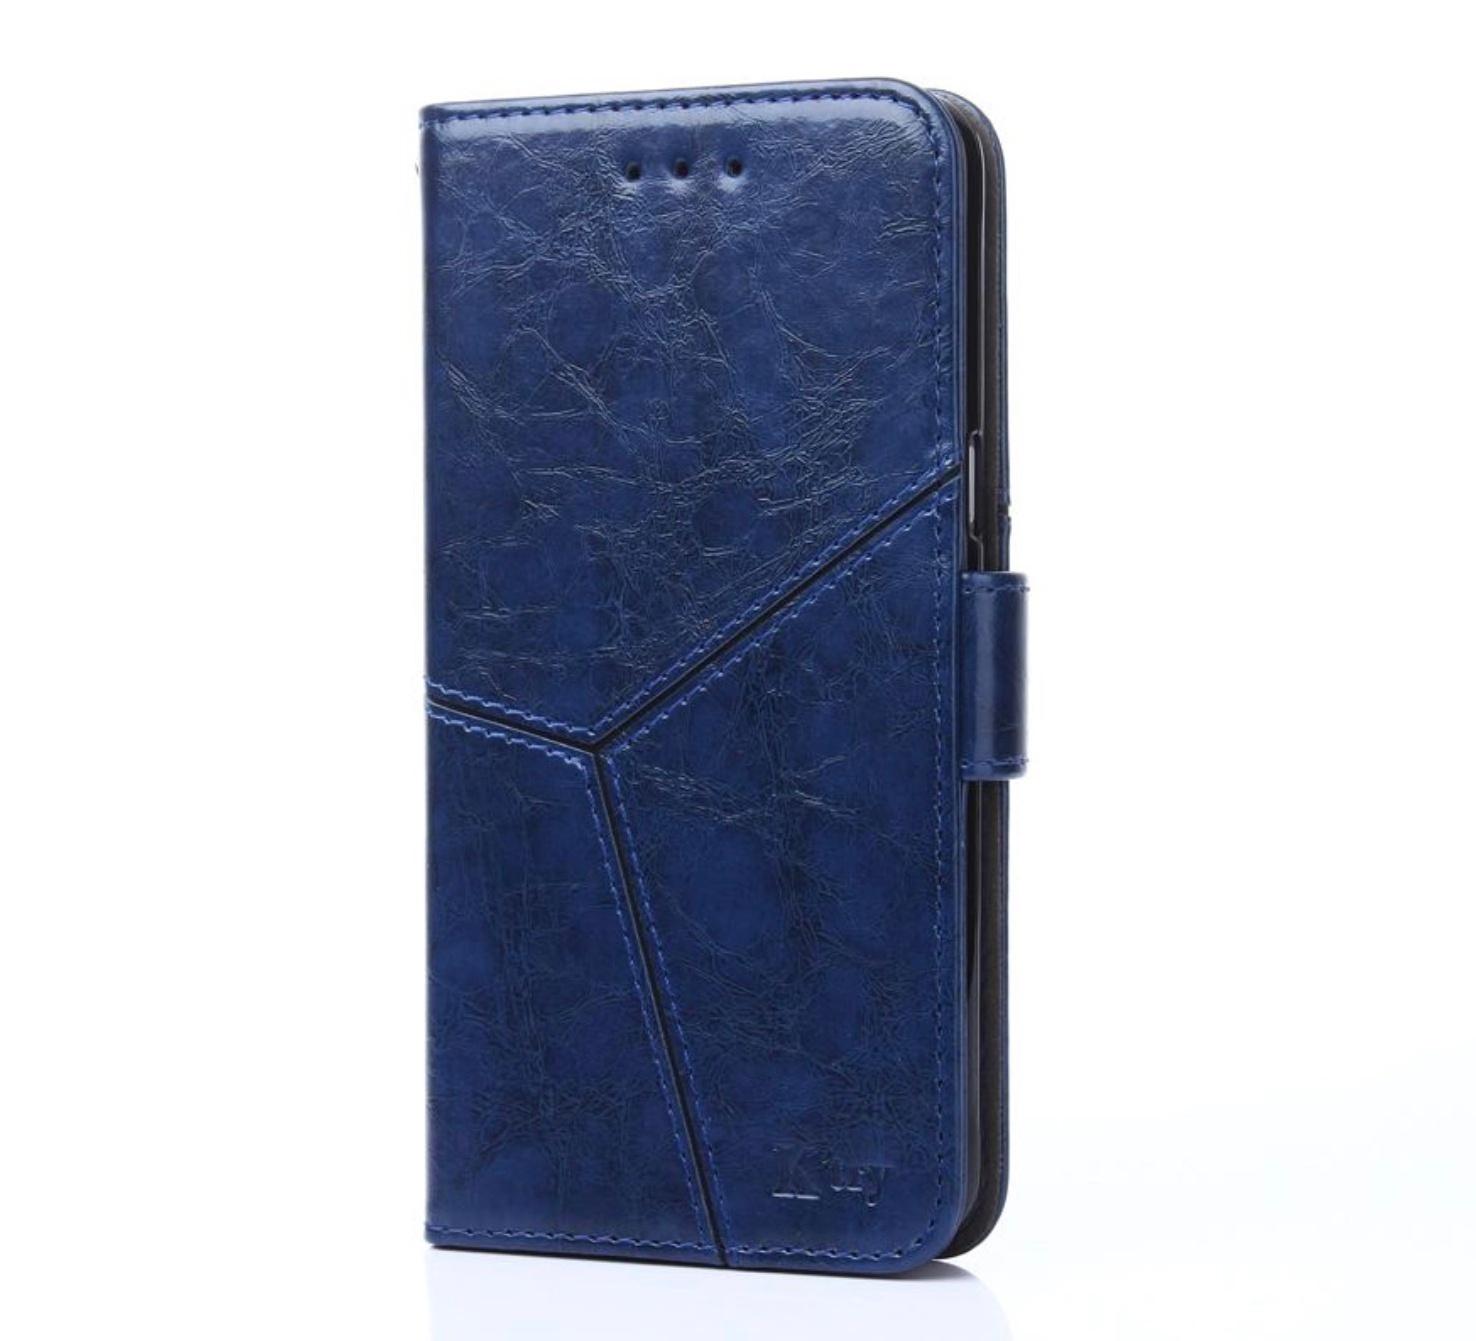 Чехол-книжка MyPads для Huawei Y5 Lite 2018 (DRA-LX5) / Huawei Enjoy 8E Lite (DRA-AL00)/ Honor 7S прошитый по контуру с необычным геометрическим швом синий